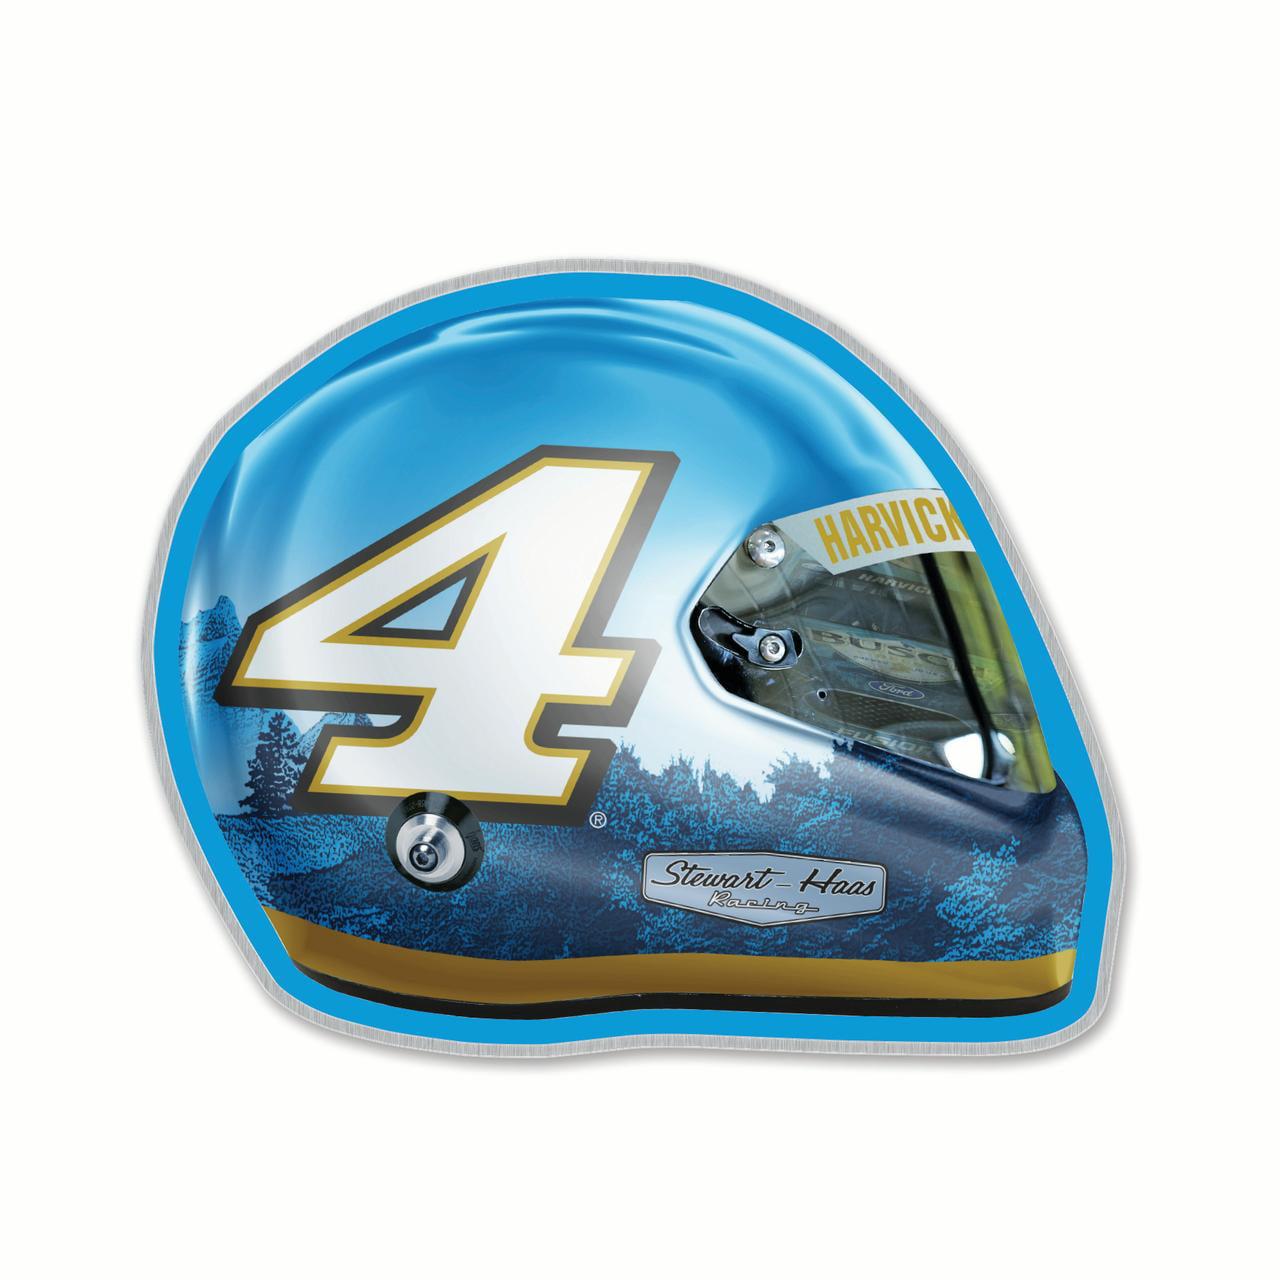 Kevin Harvick WinCraft Helmet Pin - No Size